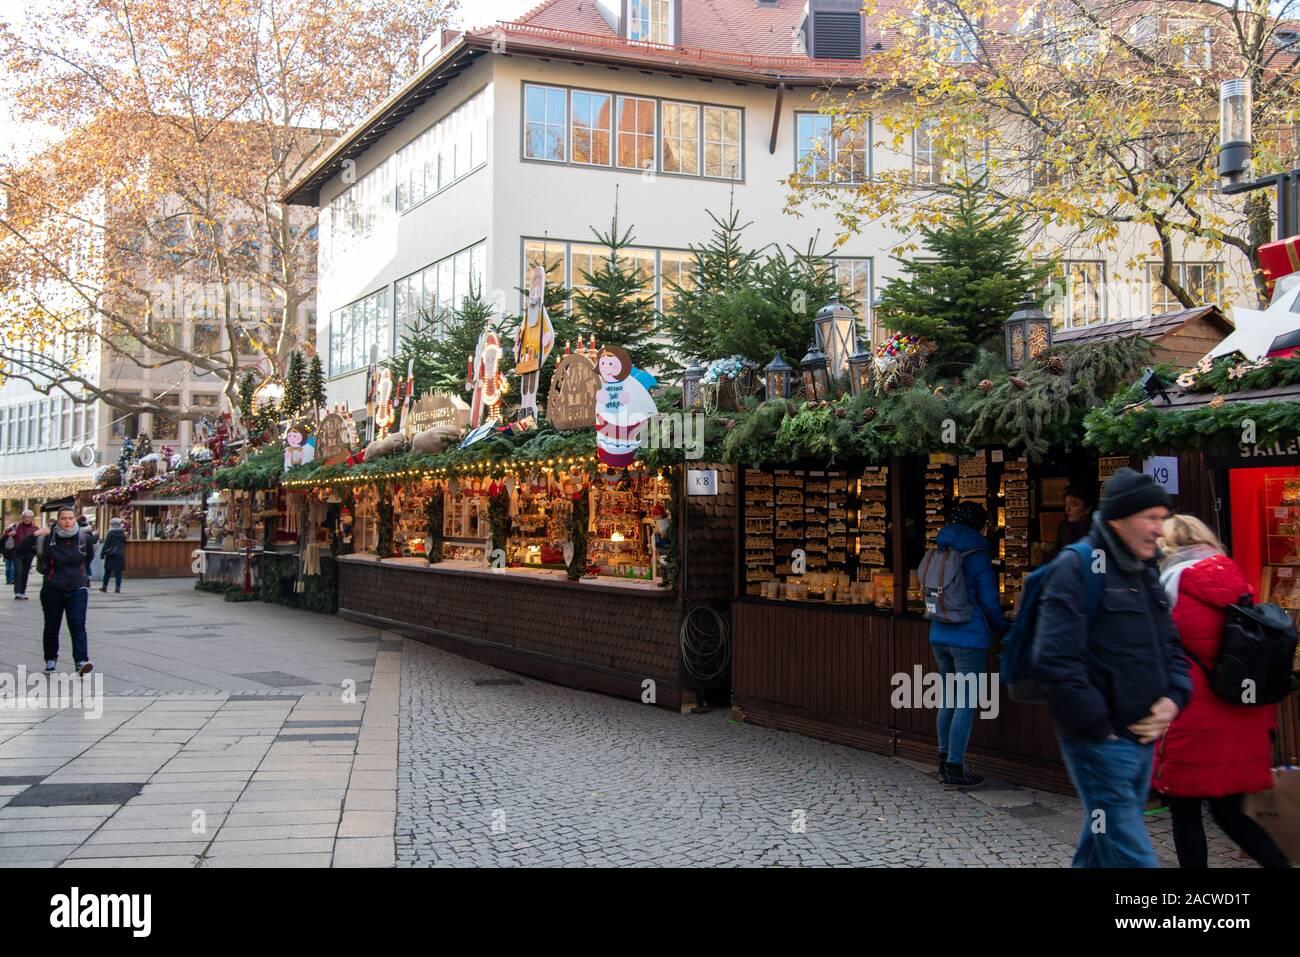 Stuttgart, un mercadillo navideño con mucho encanto Foto de stock